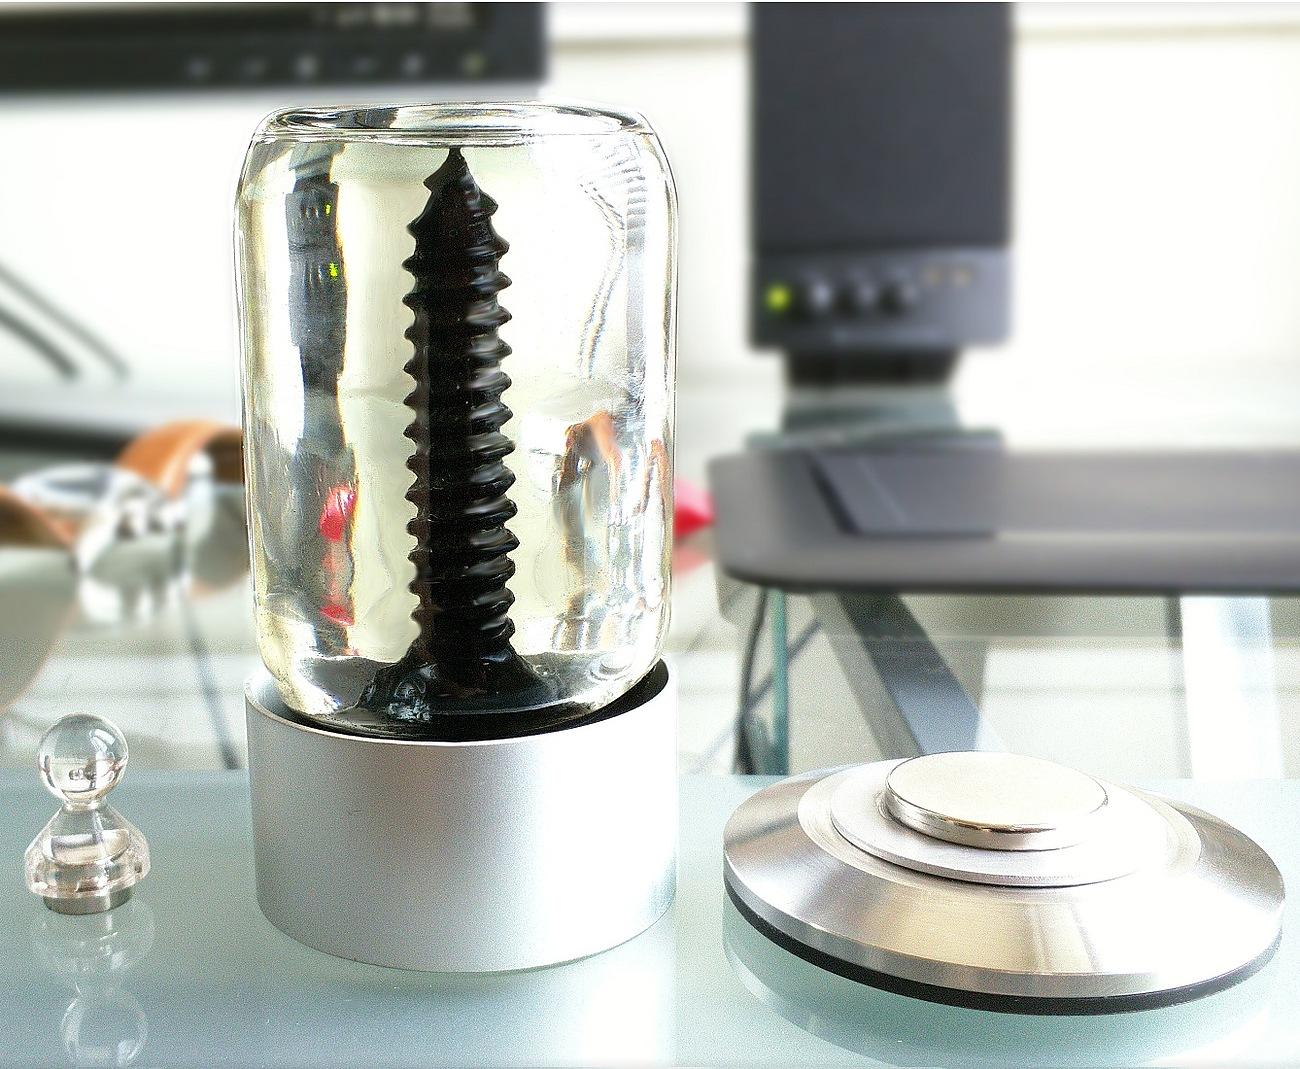 RIZE+%26%238211%3B+Spinning+Ferrofluid+Display